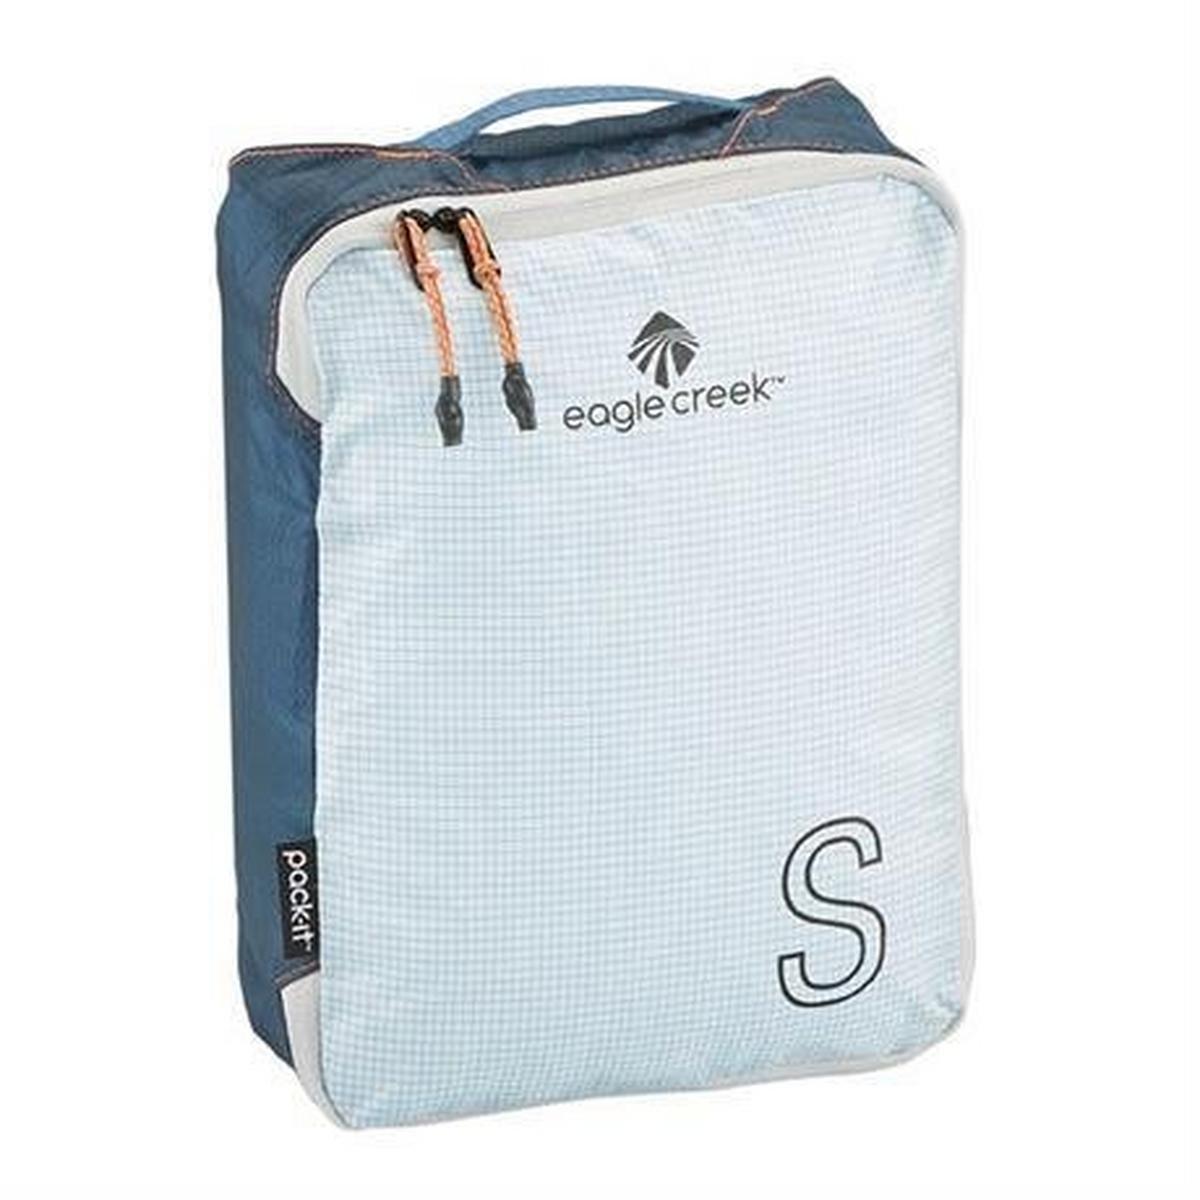 Eagle Creek Travel Lugagge: Pack-It Specter Tech Cube SMALL Indigo Blue